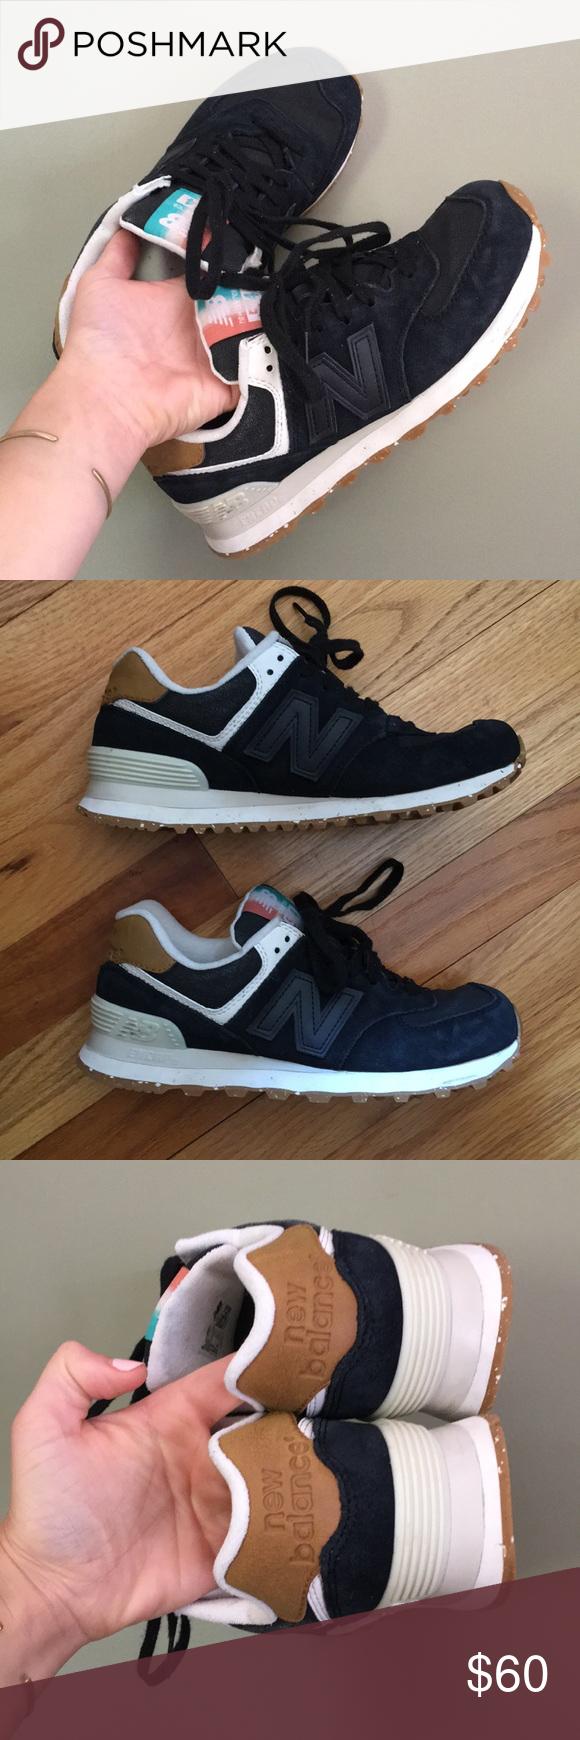 balance 574, New balance shoes